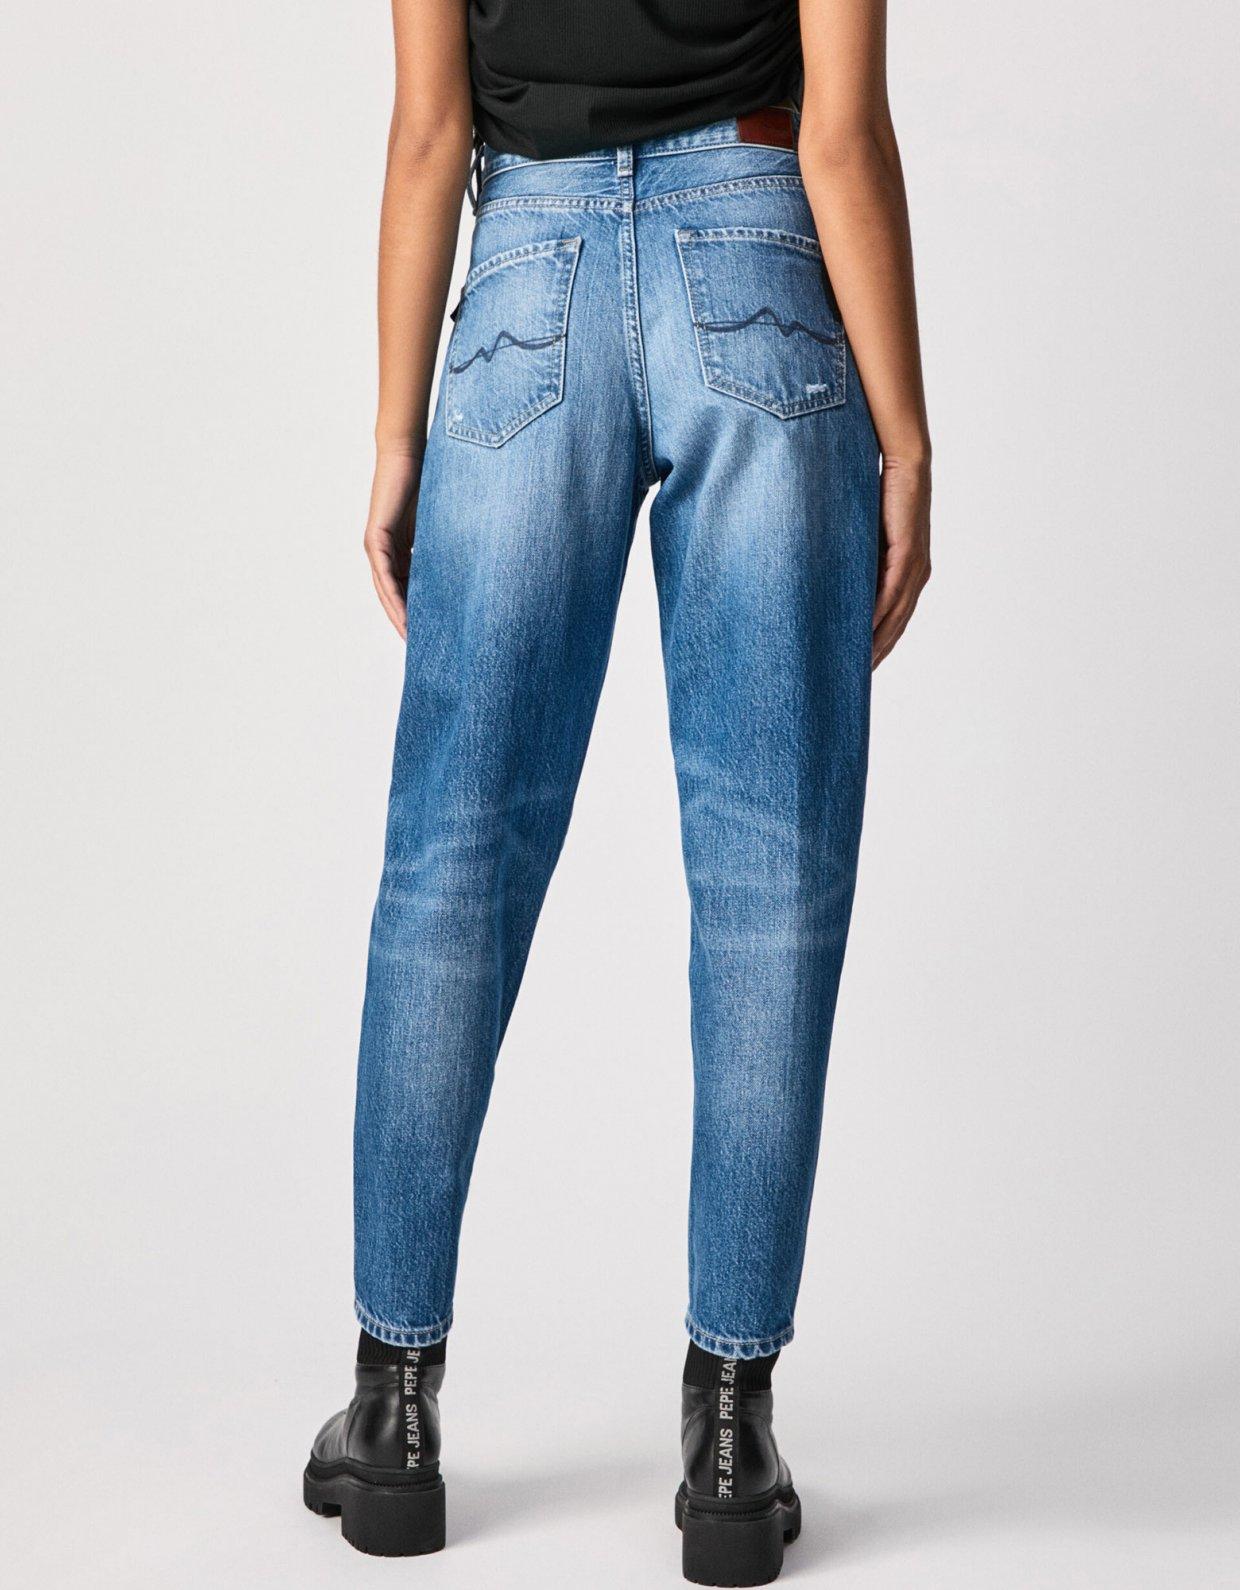 Pepe Jeans Rachel balloon fit high waist jeans